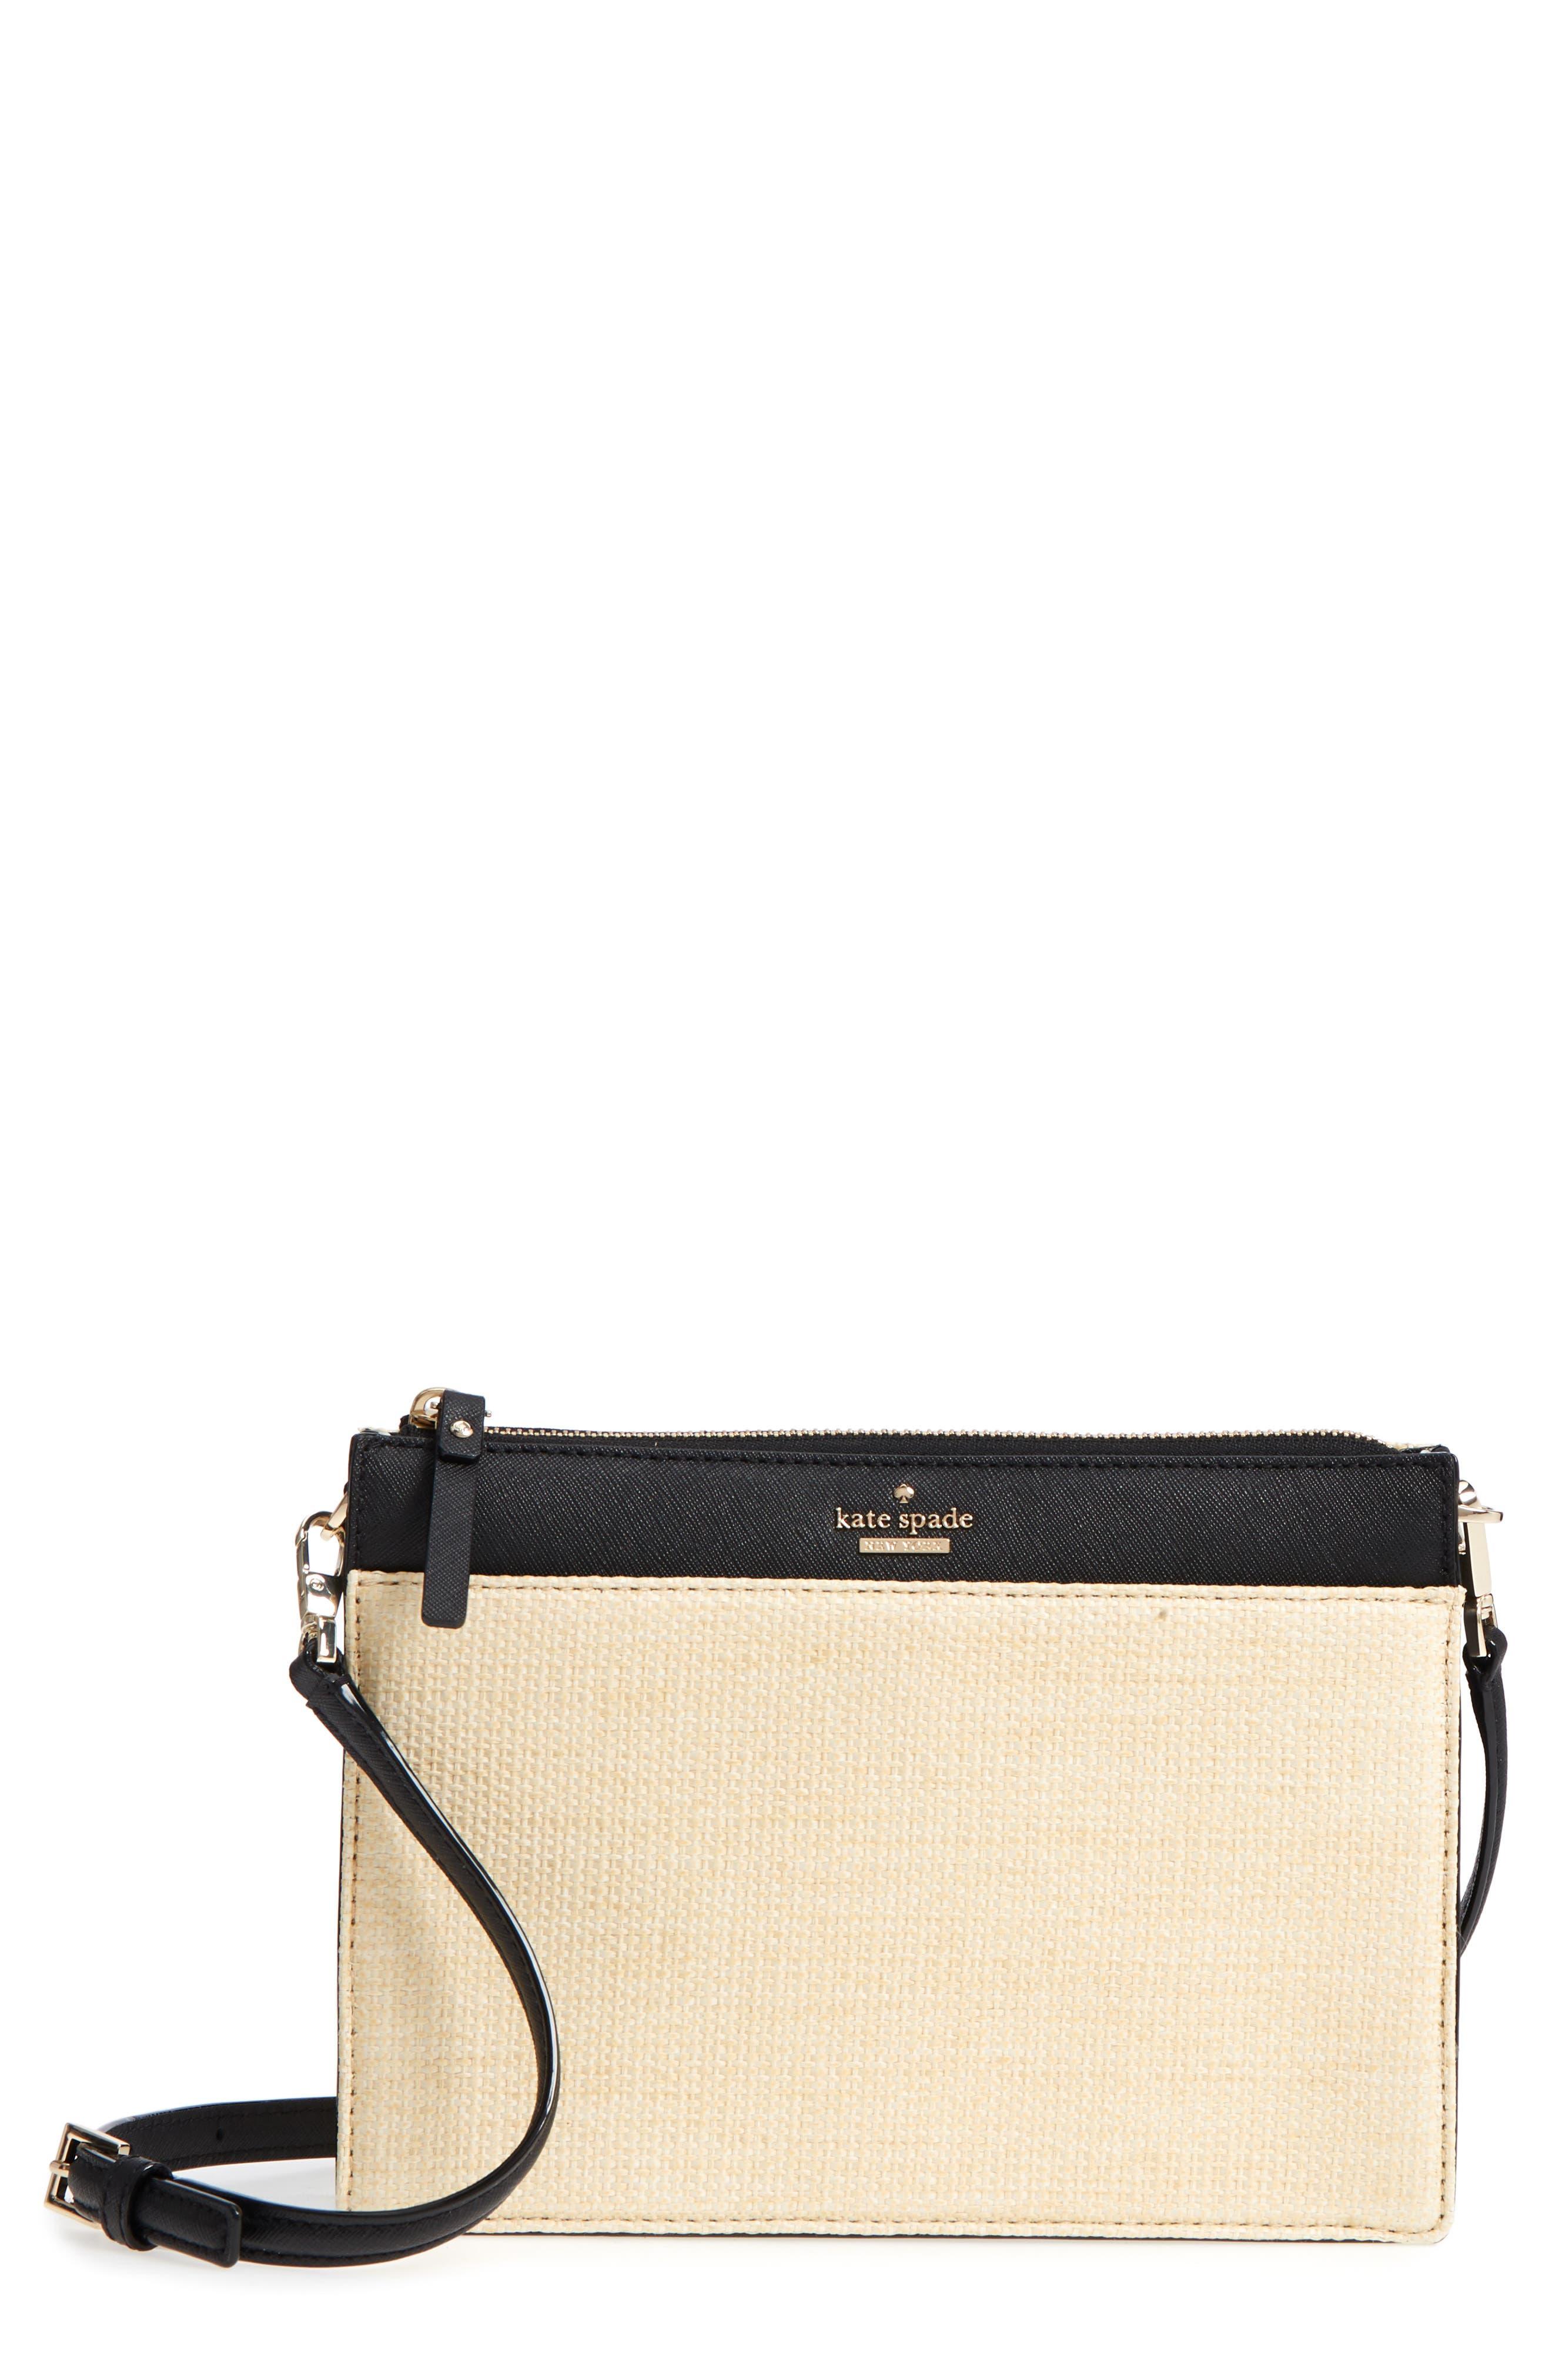 kate spade new york cameron street - clarise straw & leather shoulder bag